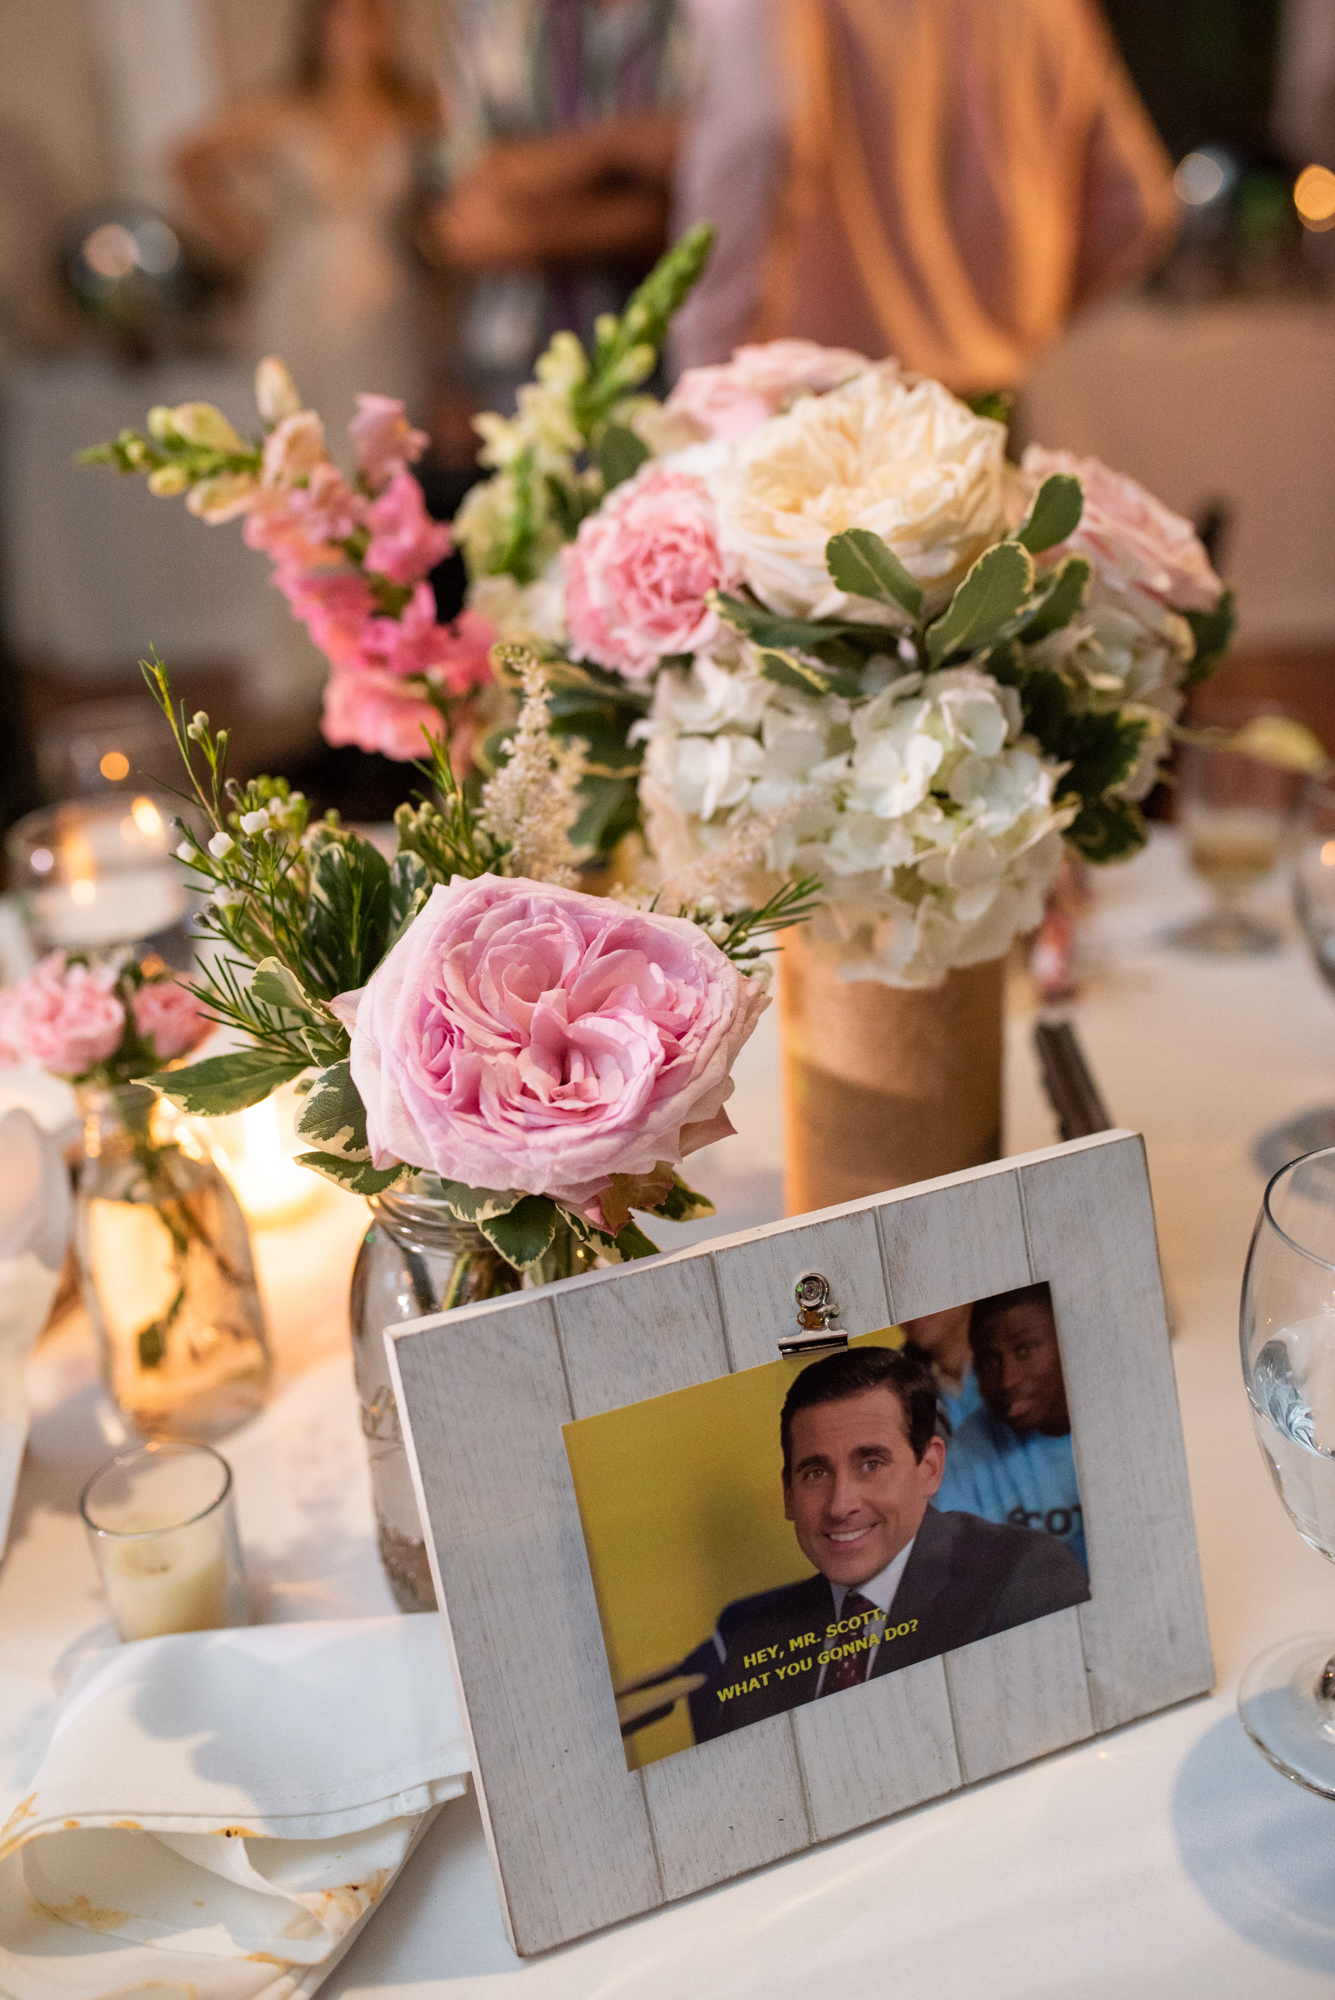 st-augustine-photographer-st-augustine-gay-wedding-sam-sex-wedding-photographer-sarah-annay-photography-white-room-weddings-55.jpg